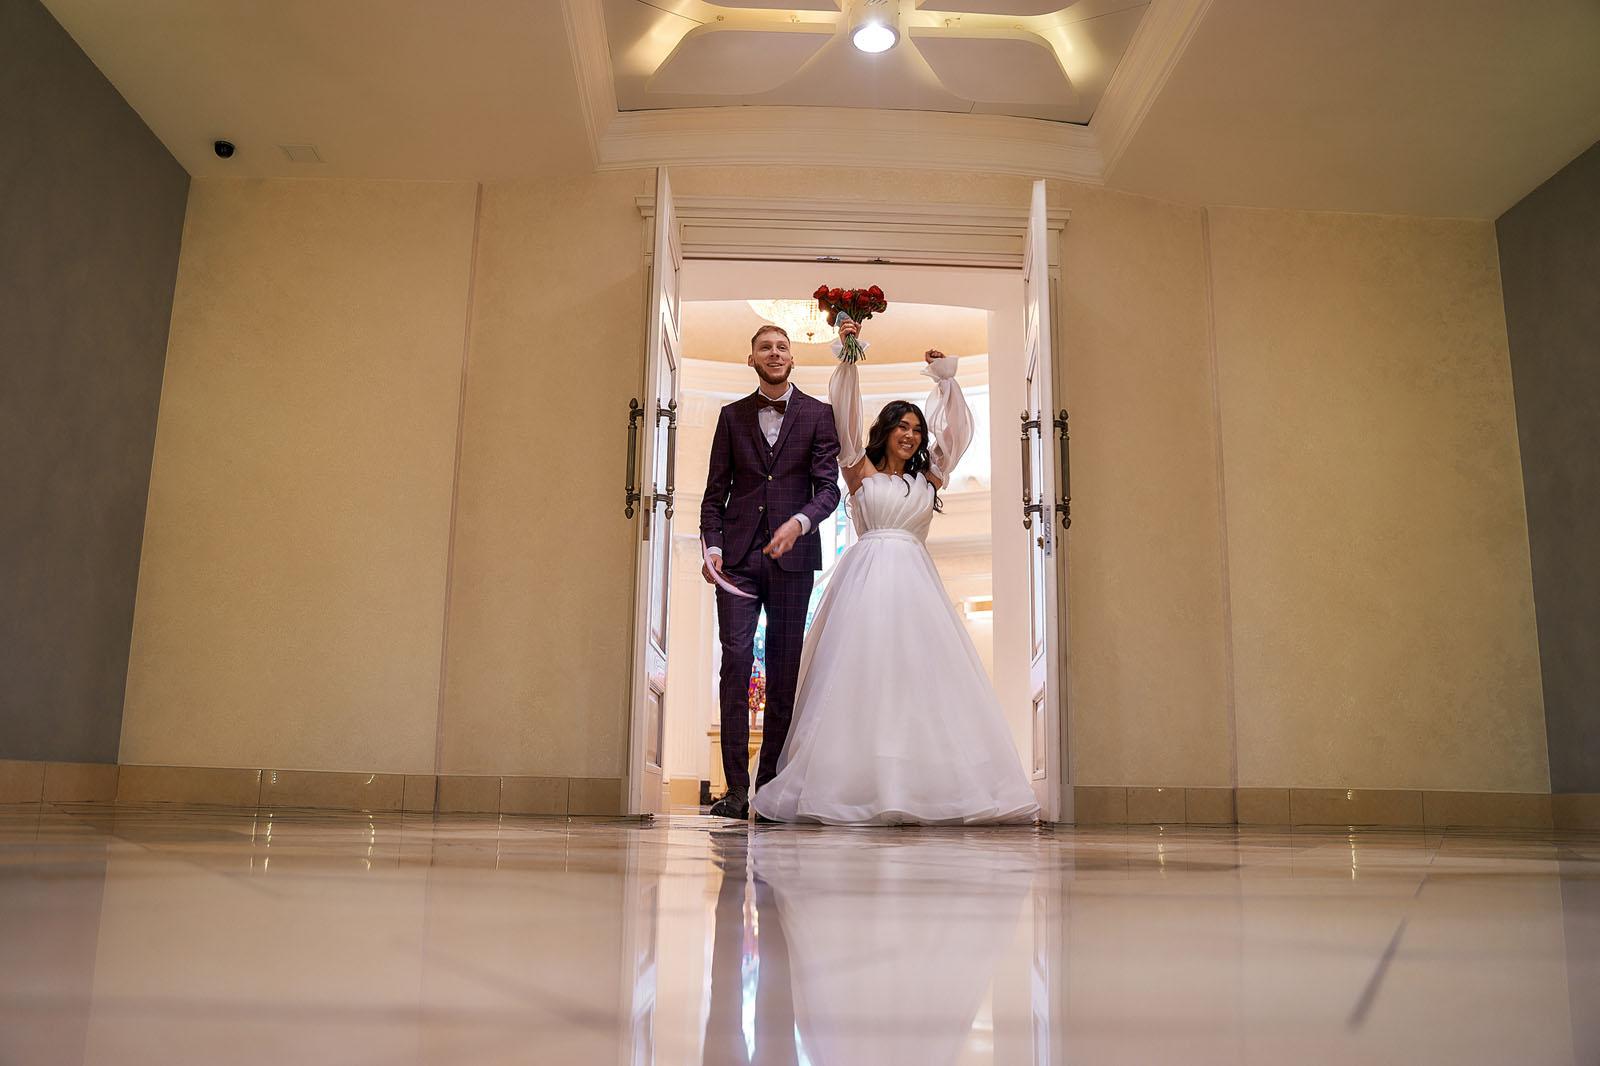 wedding@bekarev2021-04-10-10-43-43.jpg